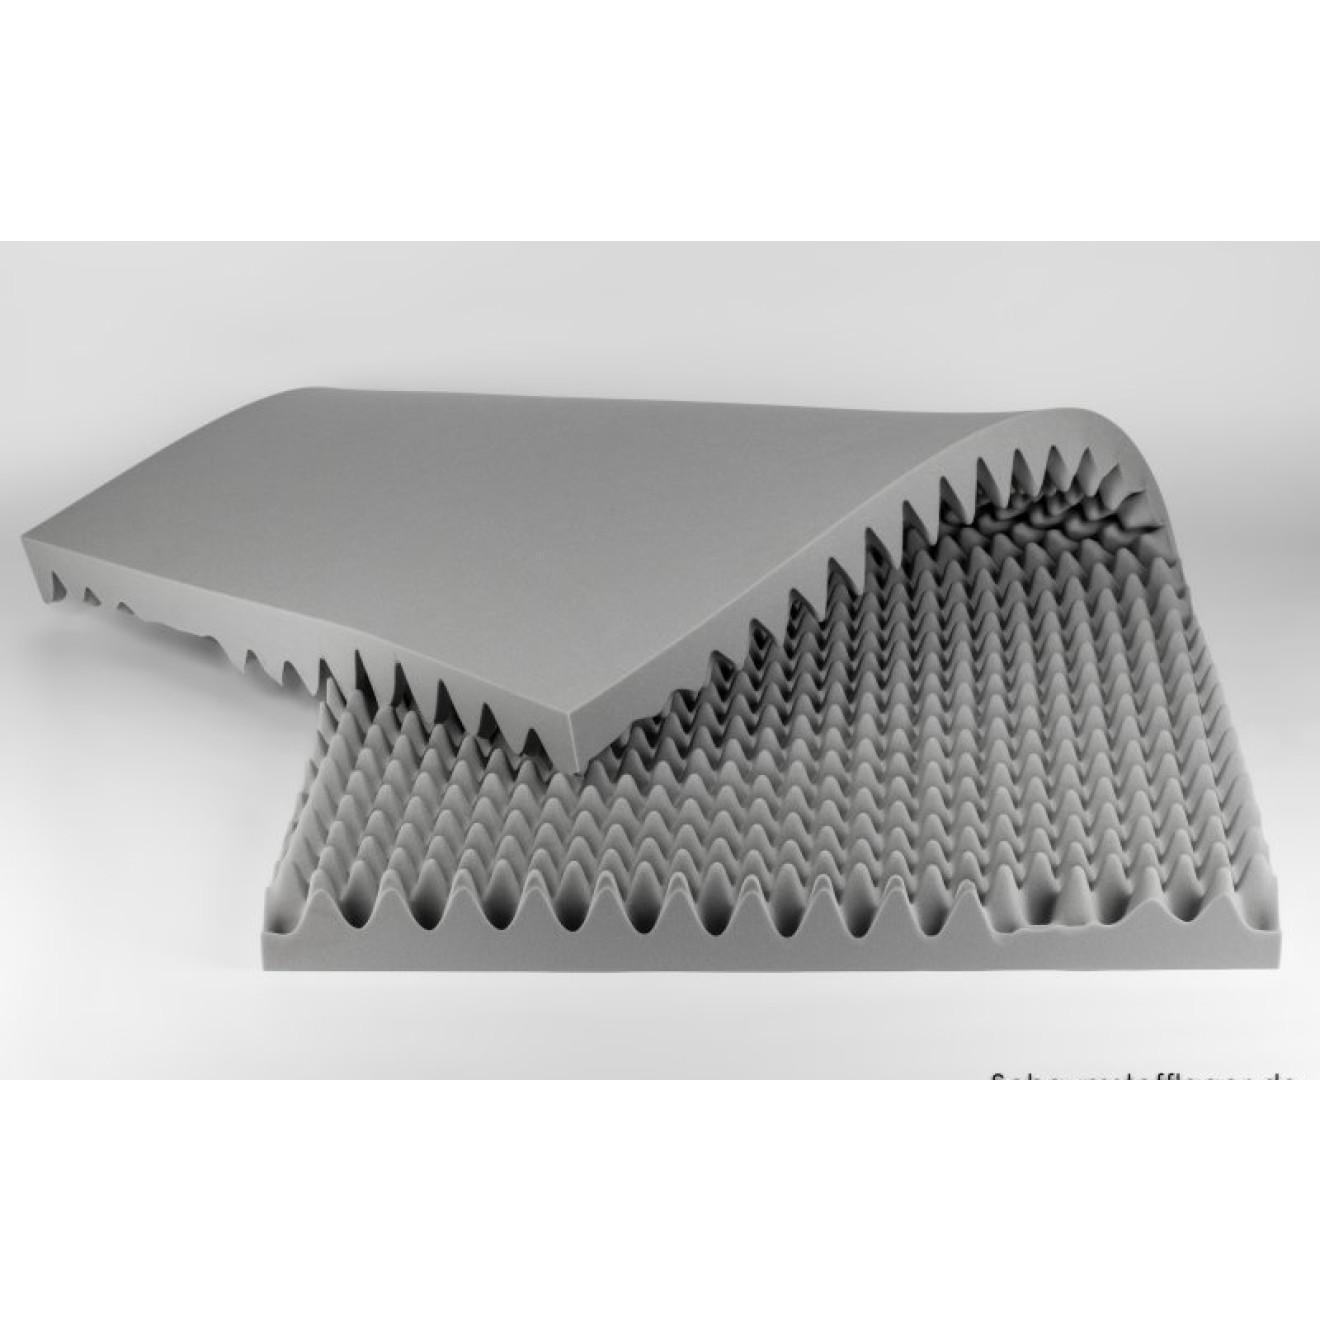 schallschutz noppenschaumstoff hier bestellen. Black Bedroom Furniture Sets. Home Design Ideas